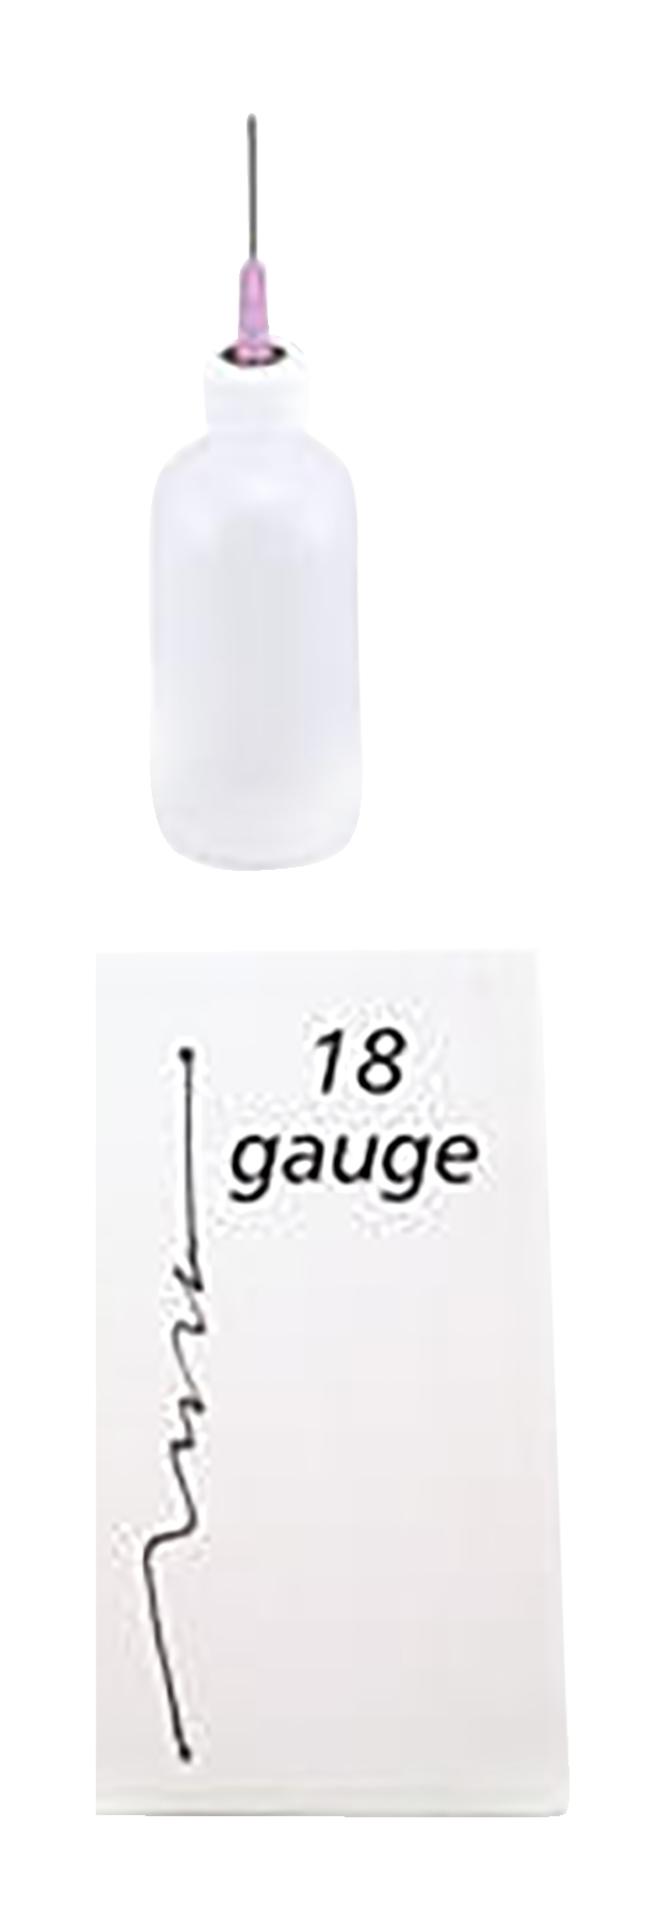 Glaze Applicators, Item Number 409733